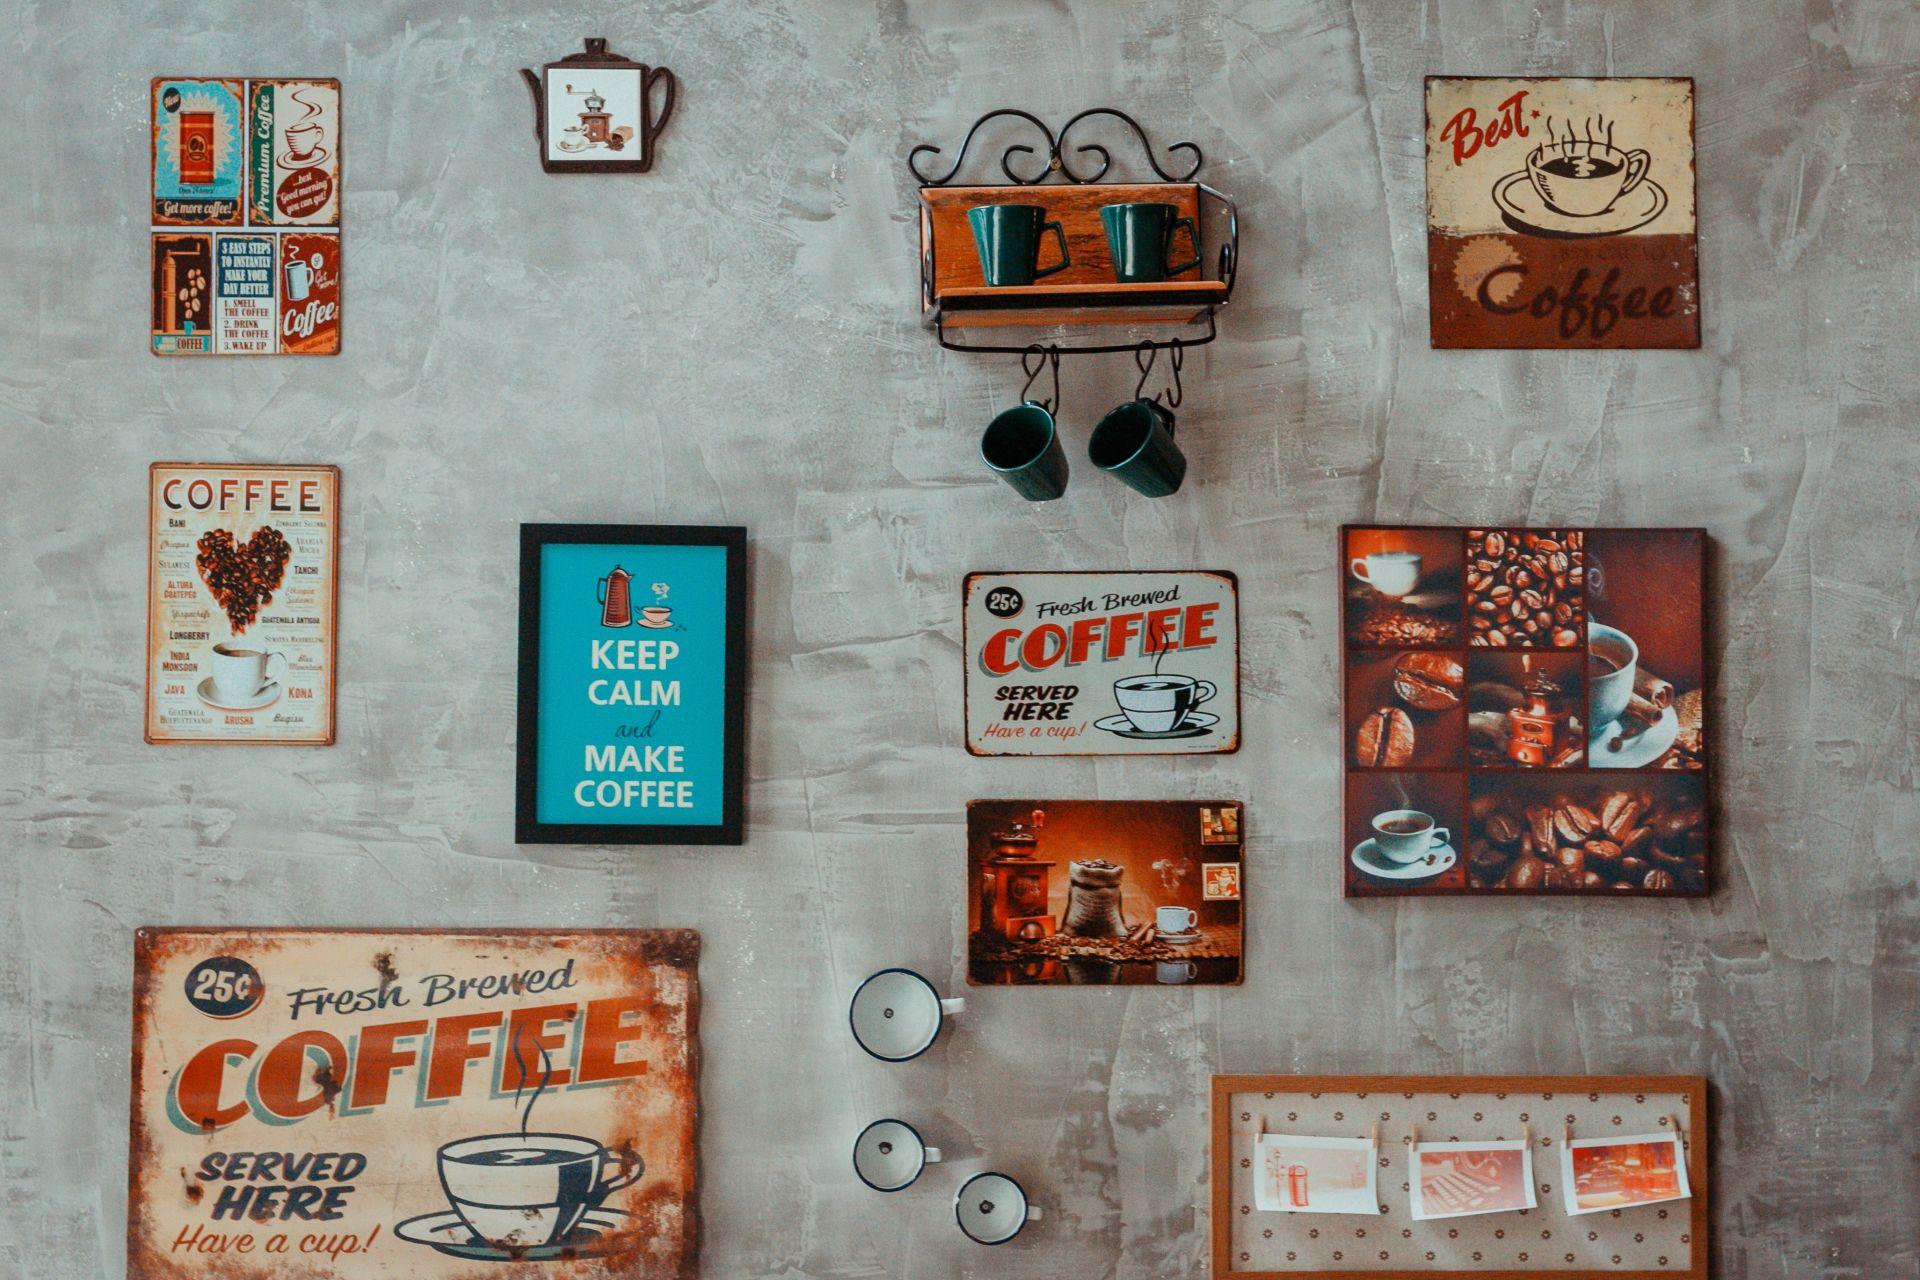 Busy Espresso Bar - Parramatta